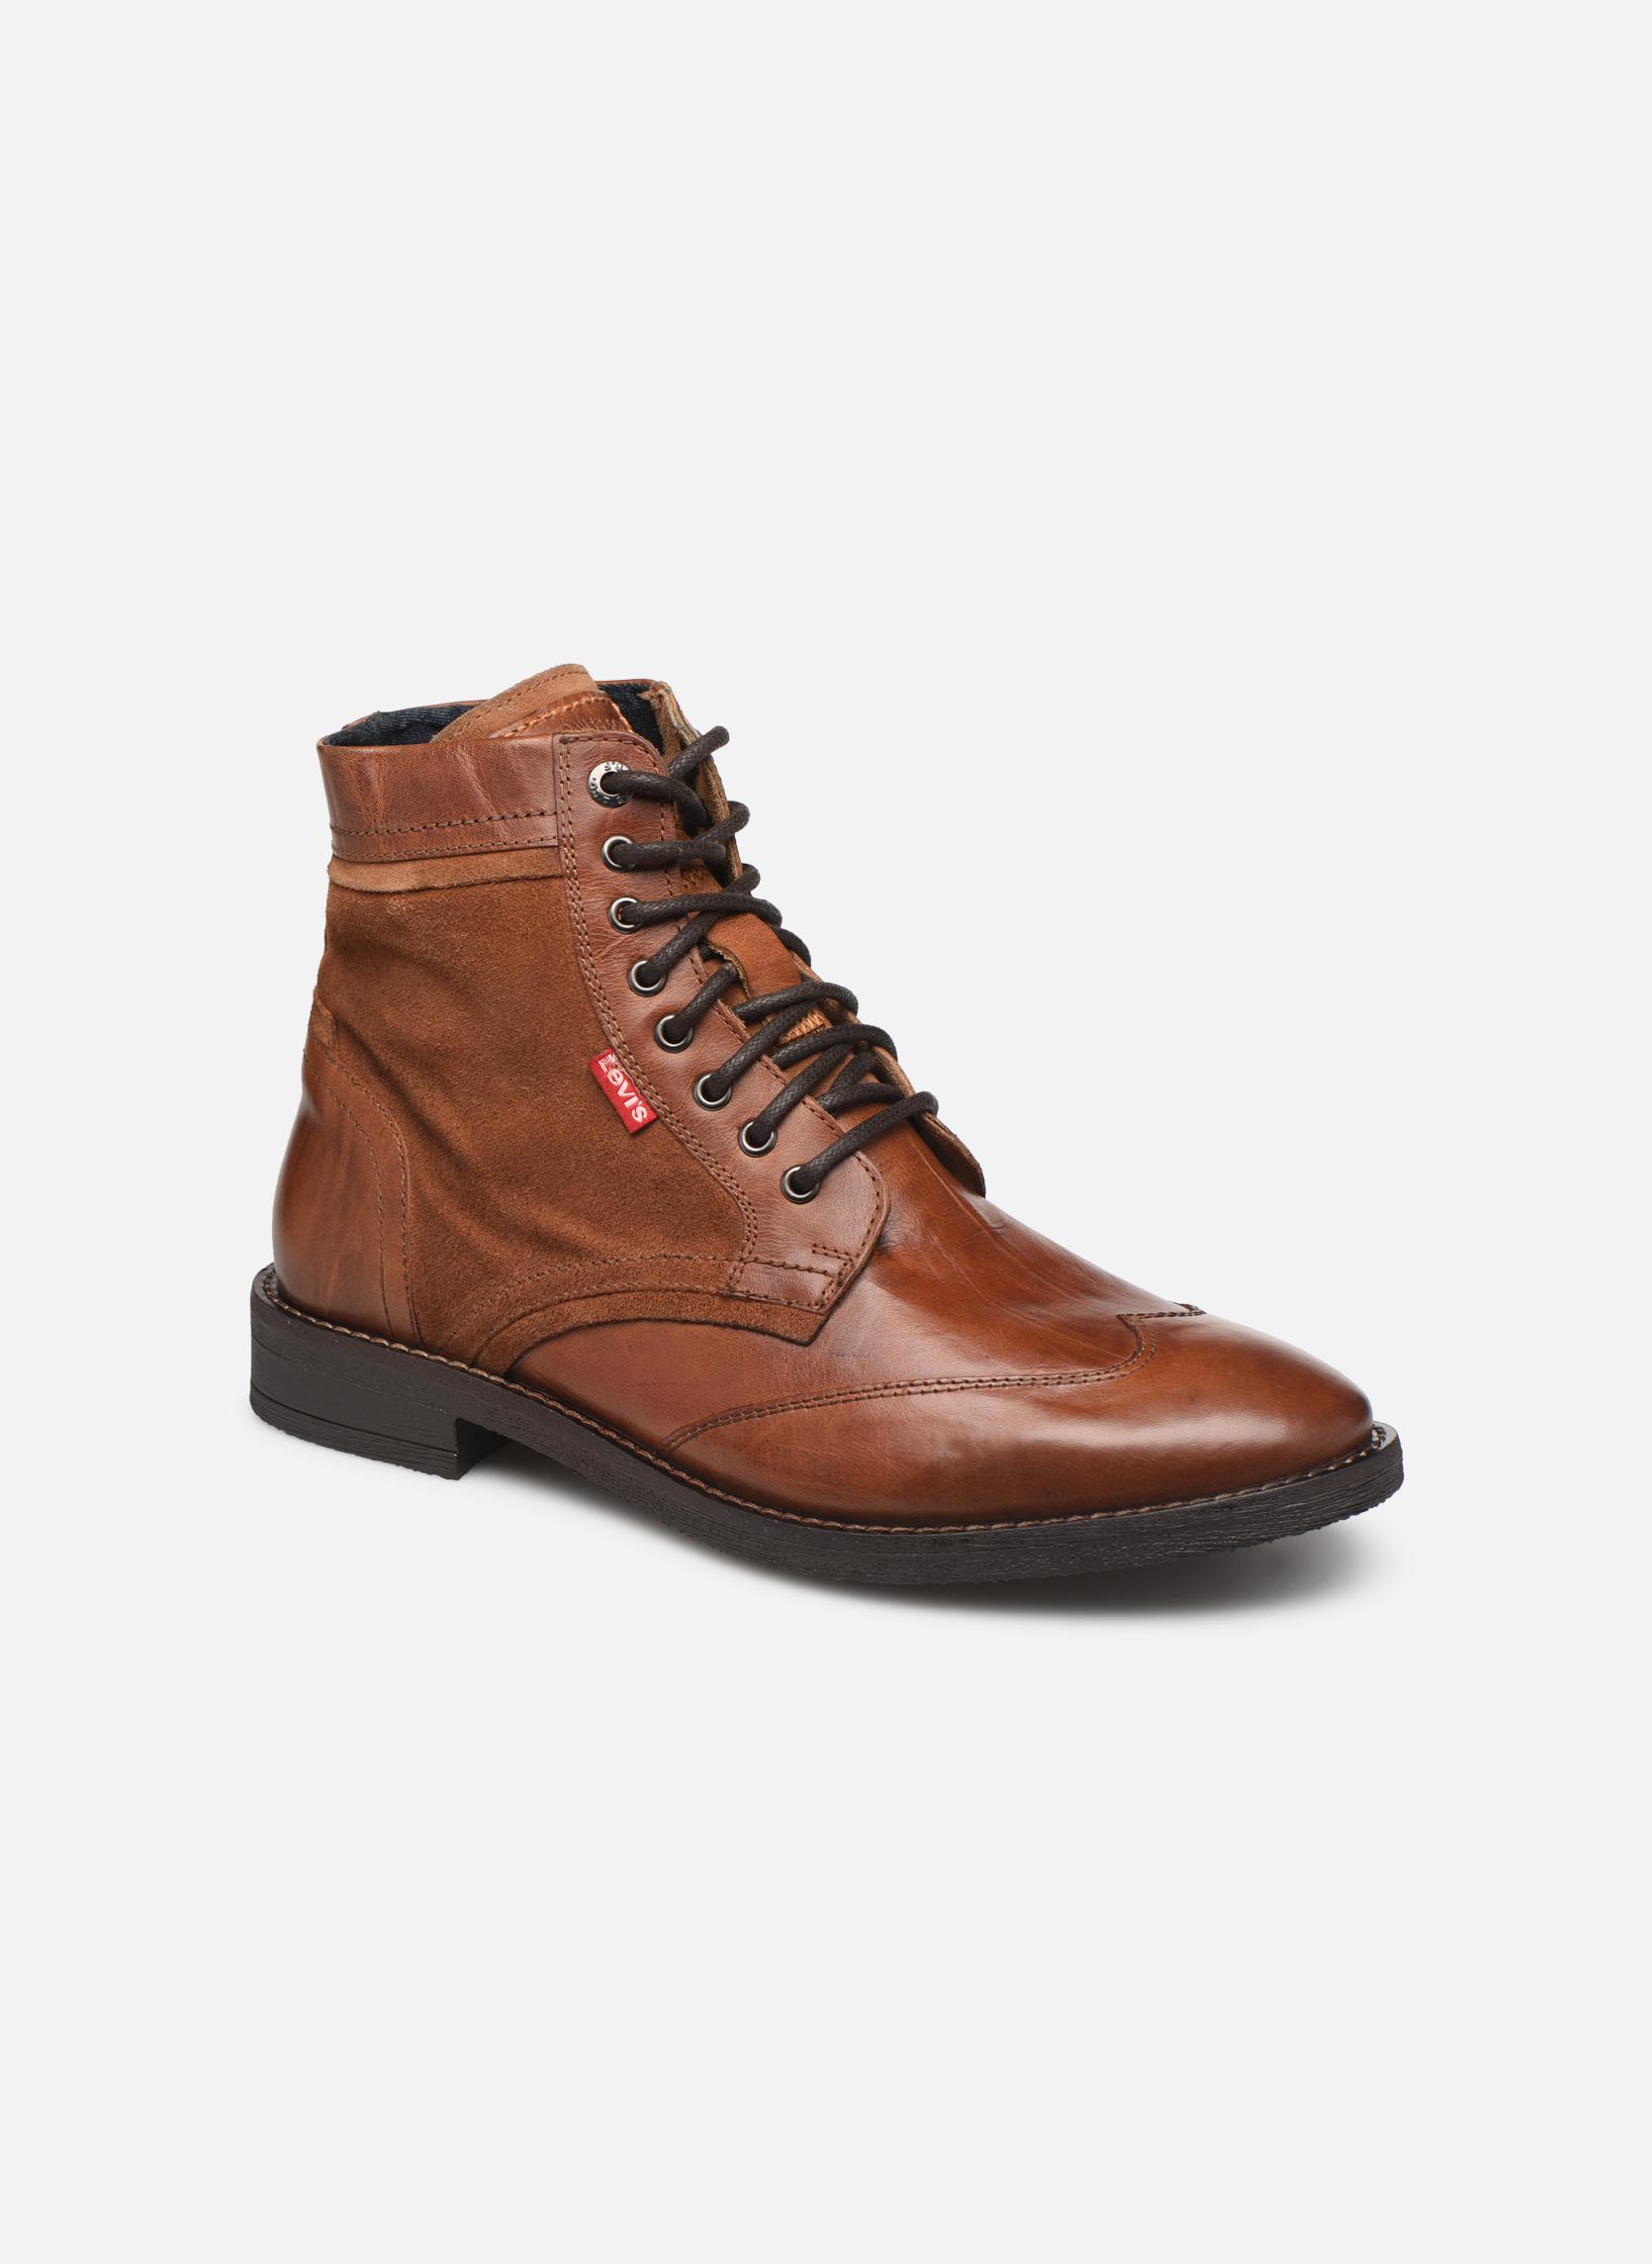 e45cffc554bb79 Sneakers Ml574 by New Balance - SchoenenTamTam.nl